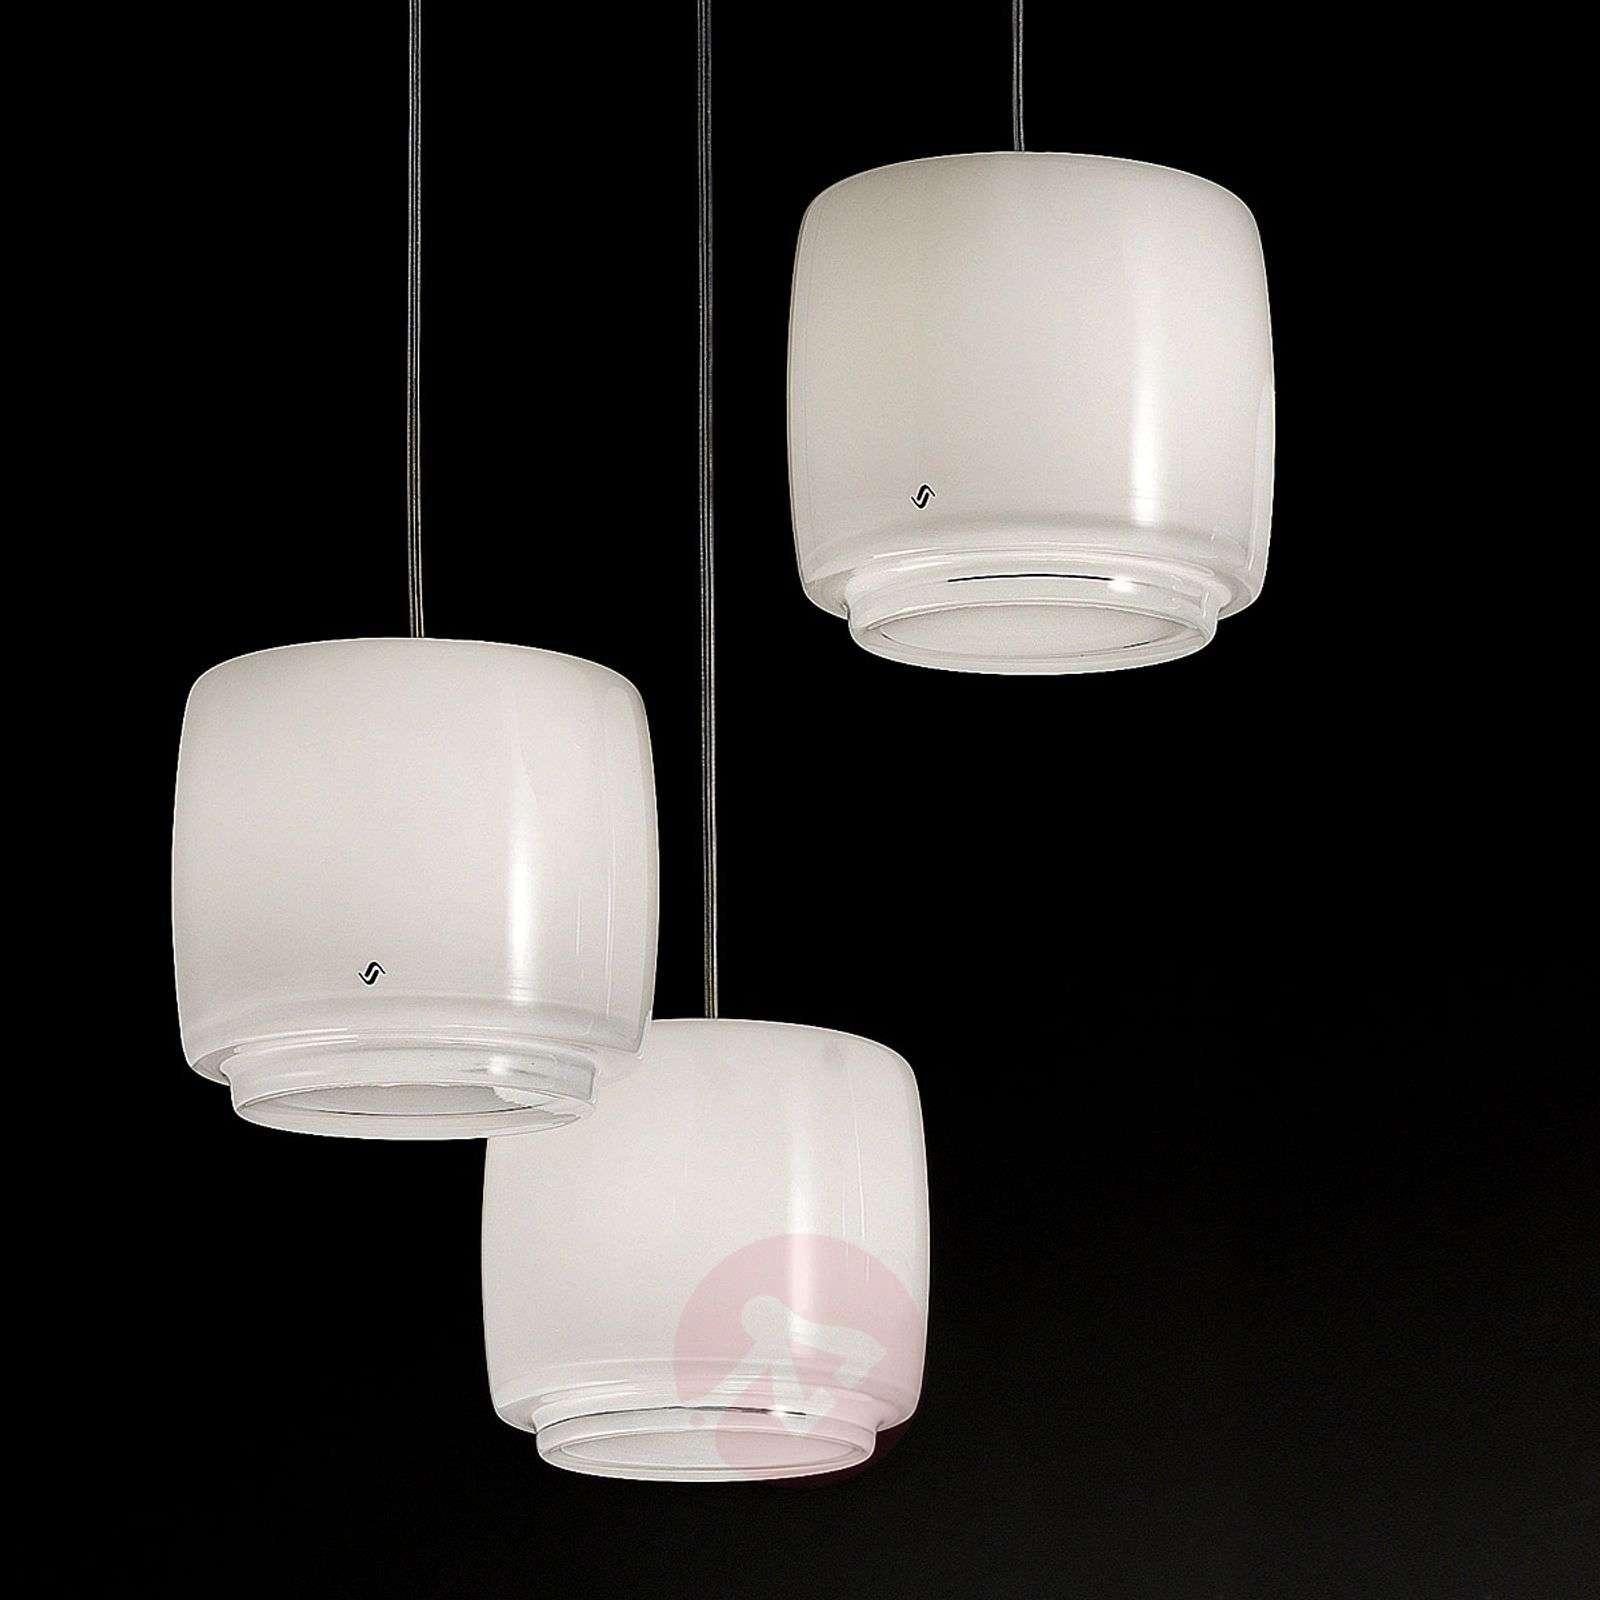 Glass hanging light Bot, diameter 16 cm-9508094-01